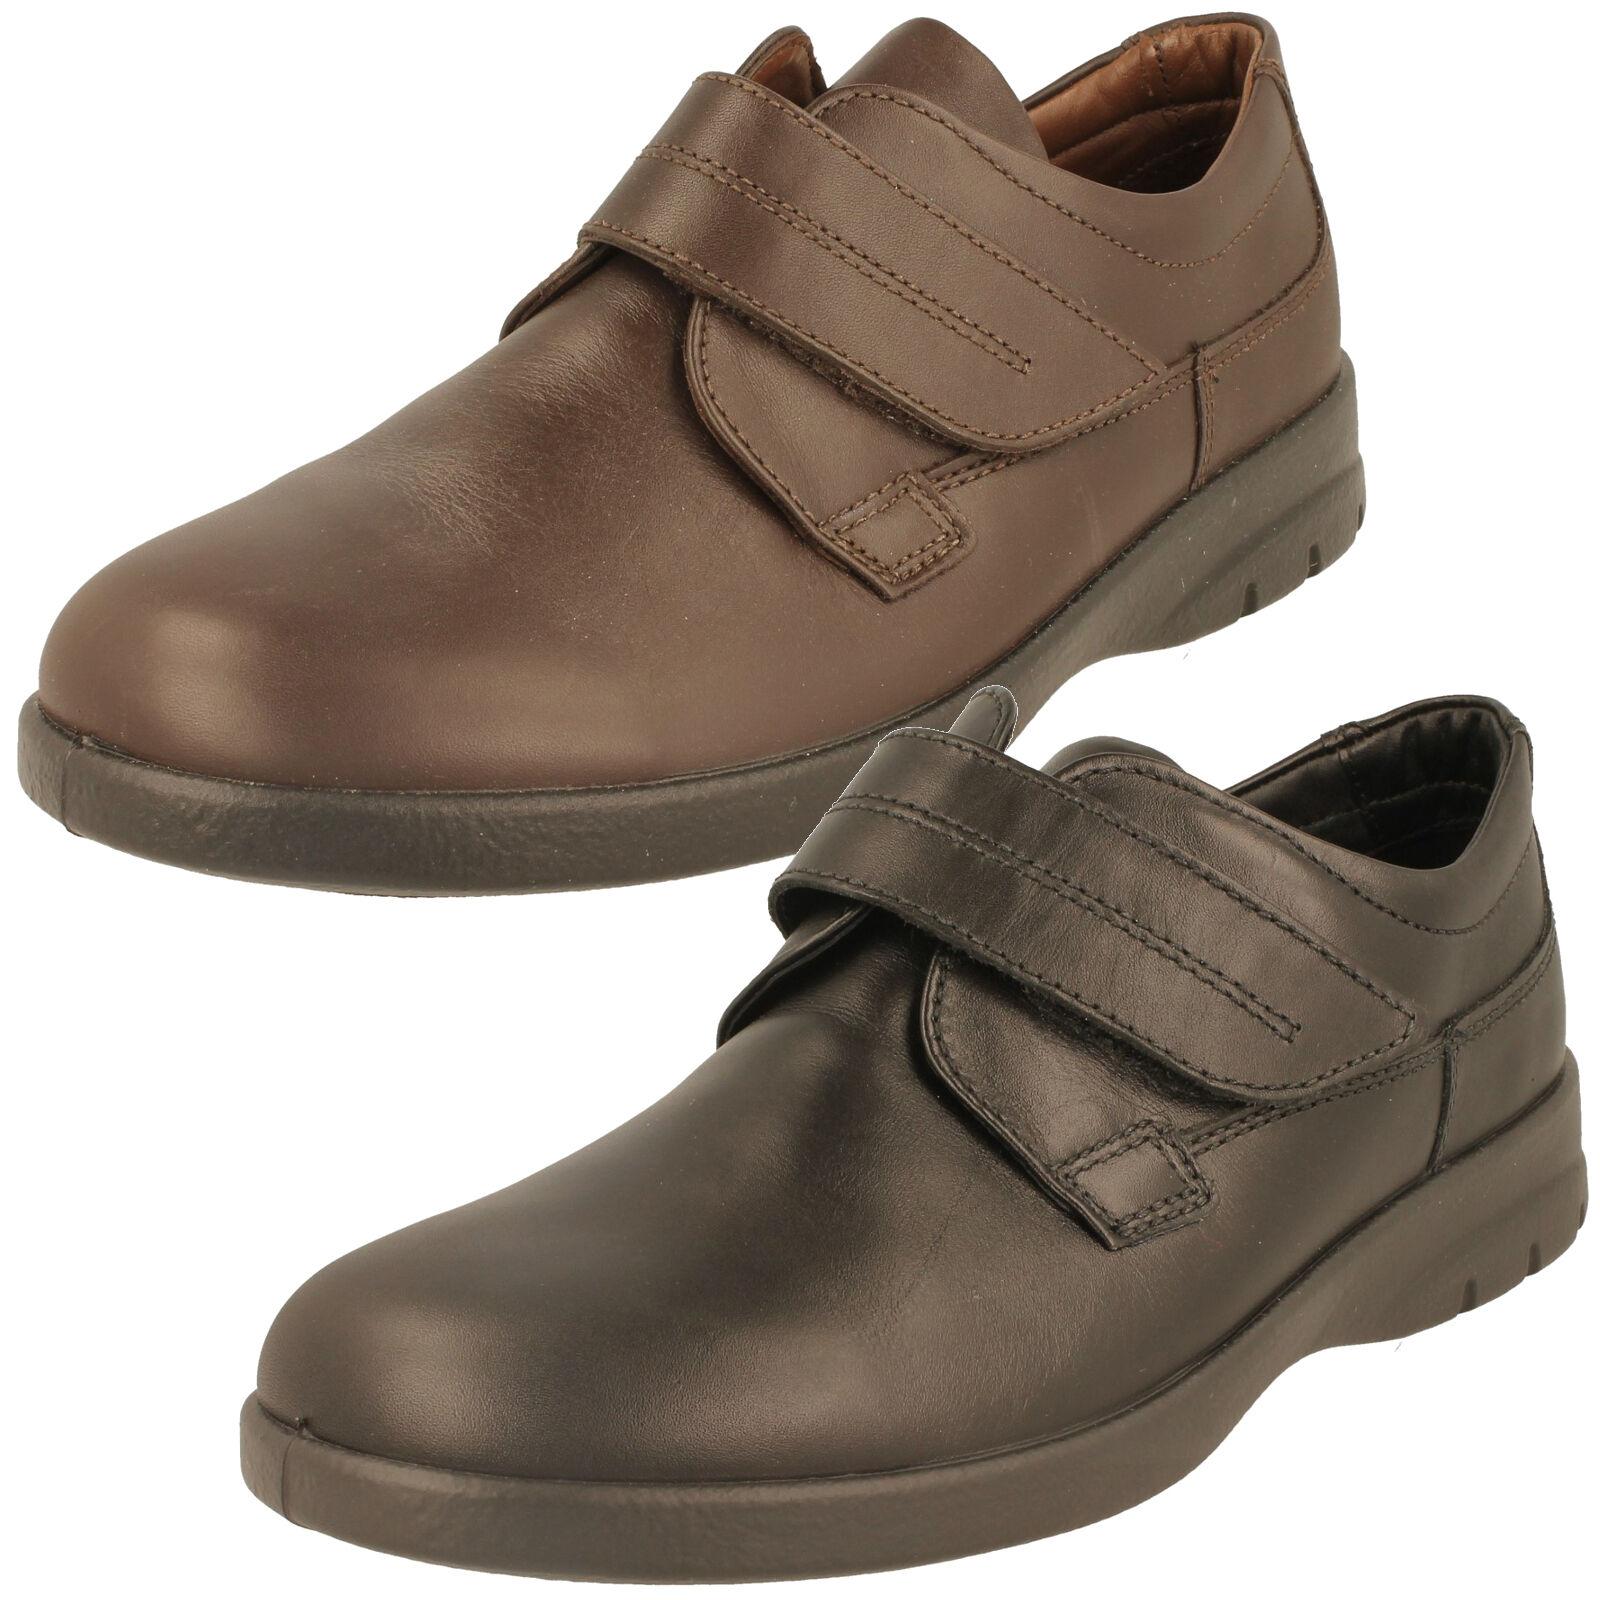 Herren Padders Bequeme Schuhe - Luft